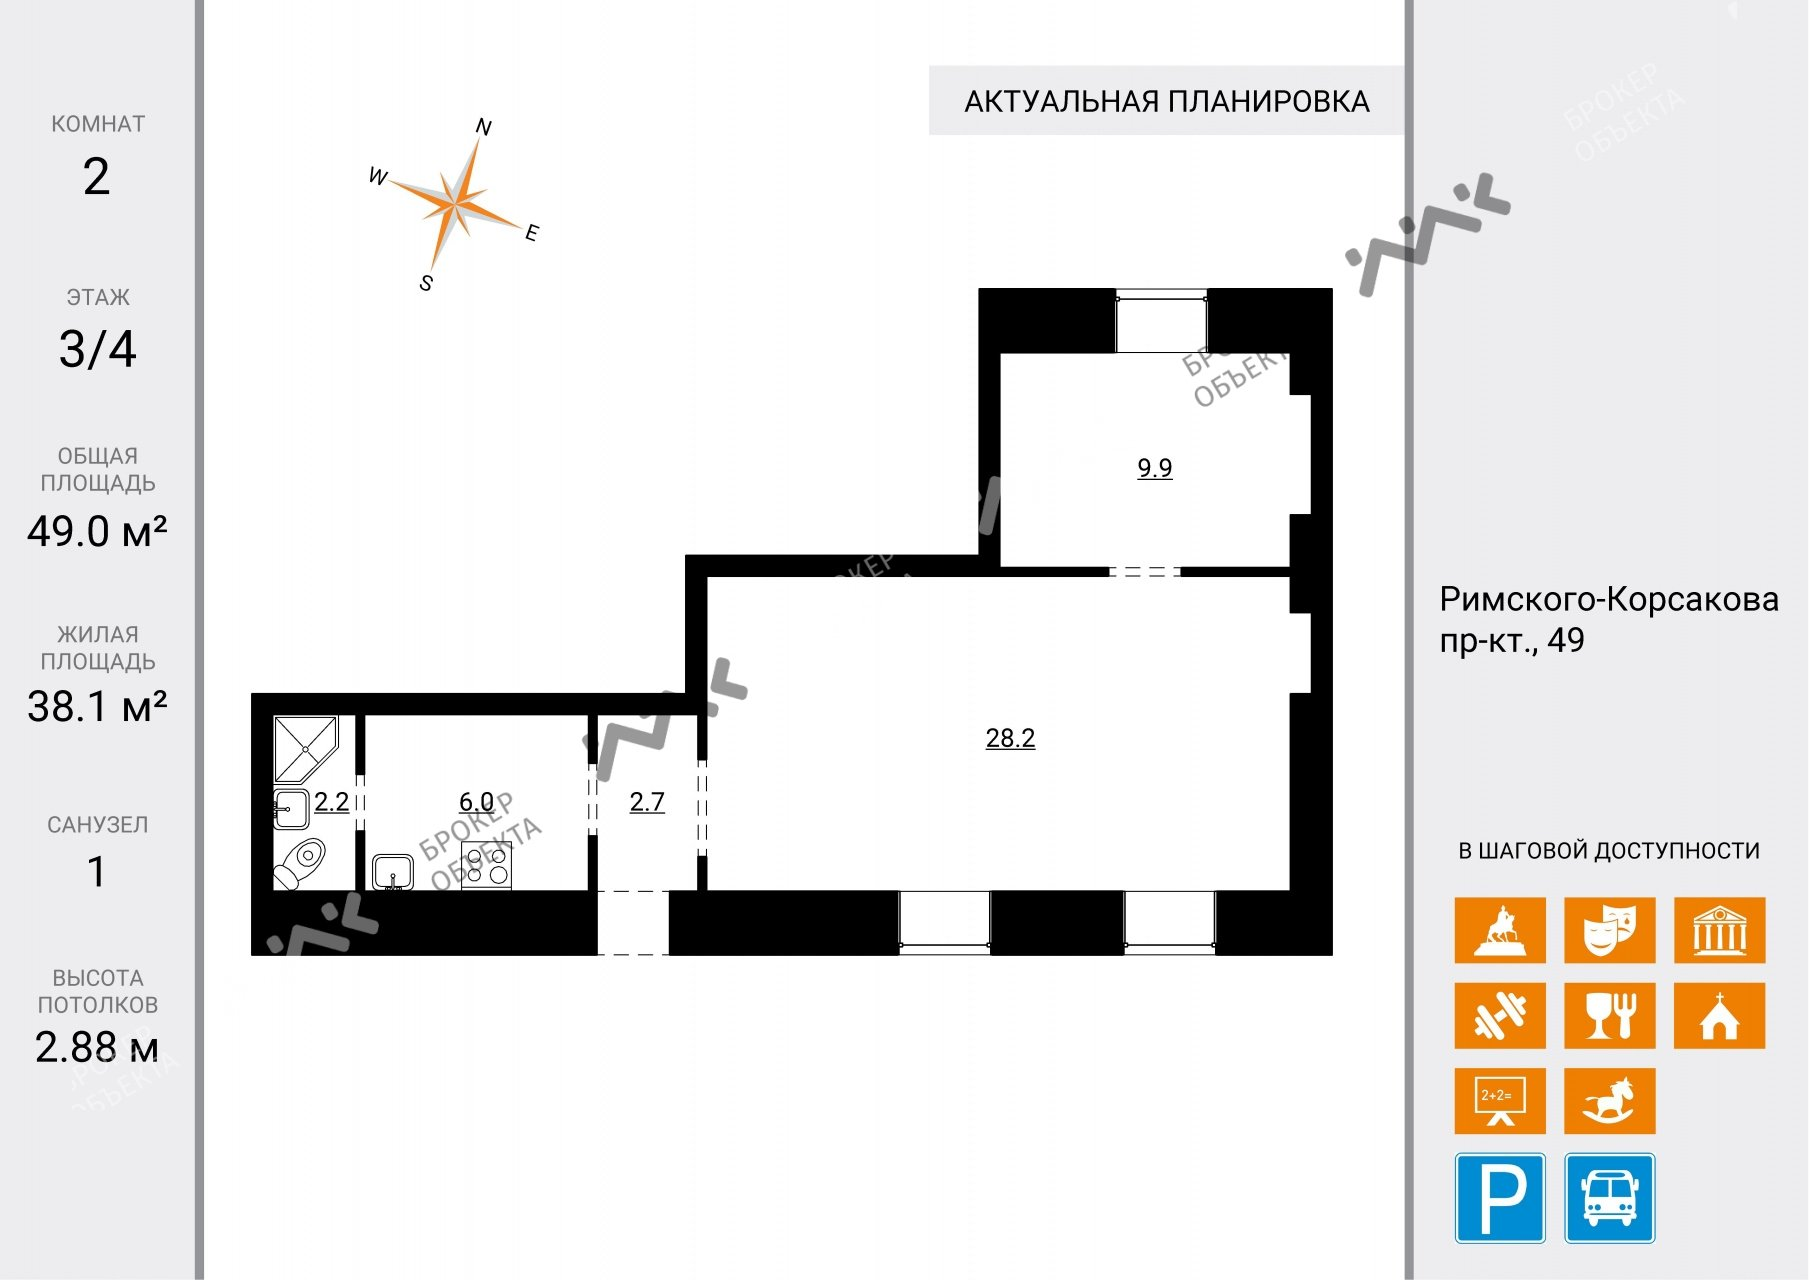 Планировка Римского-Корсакова проспект, д.49. Лот № 3291971